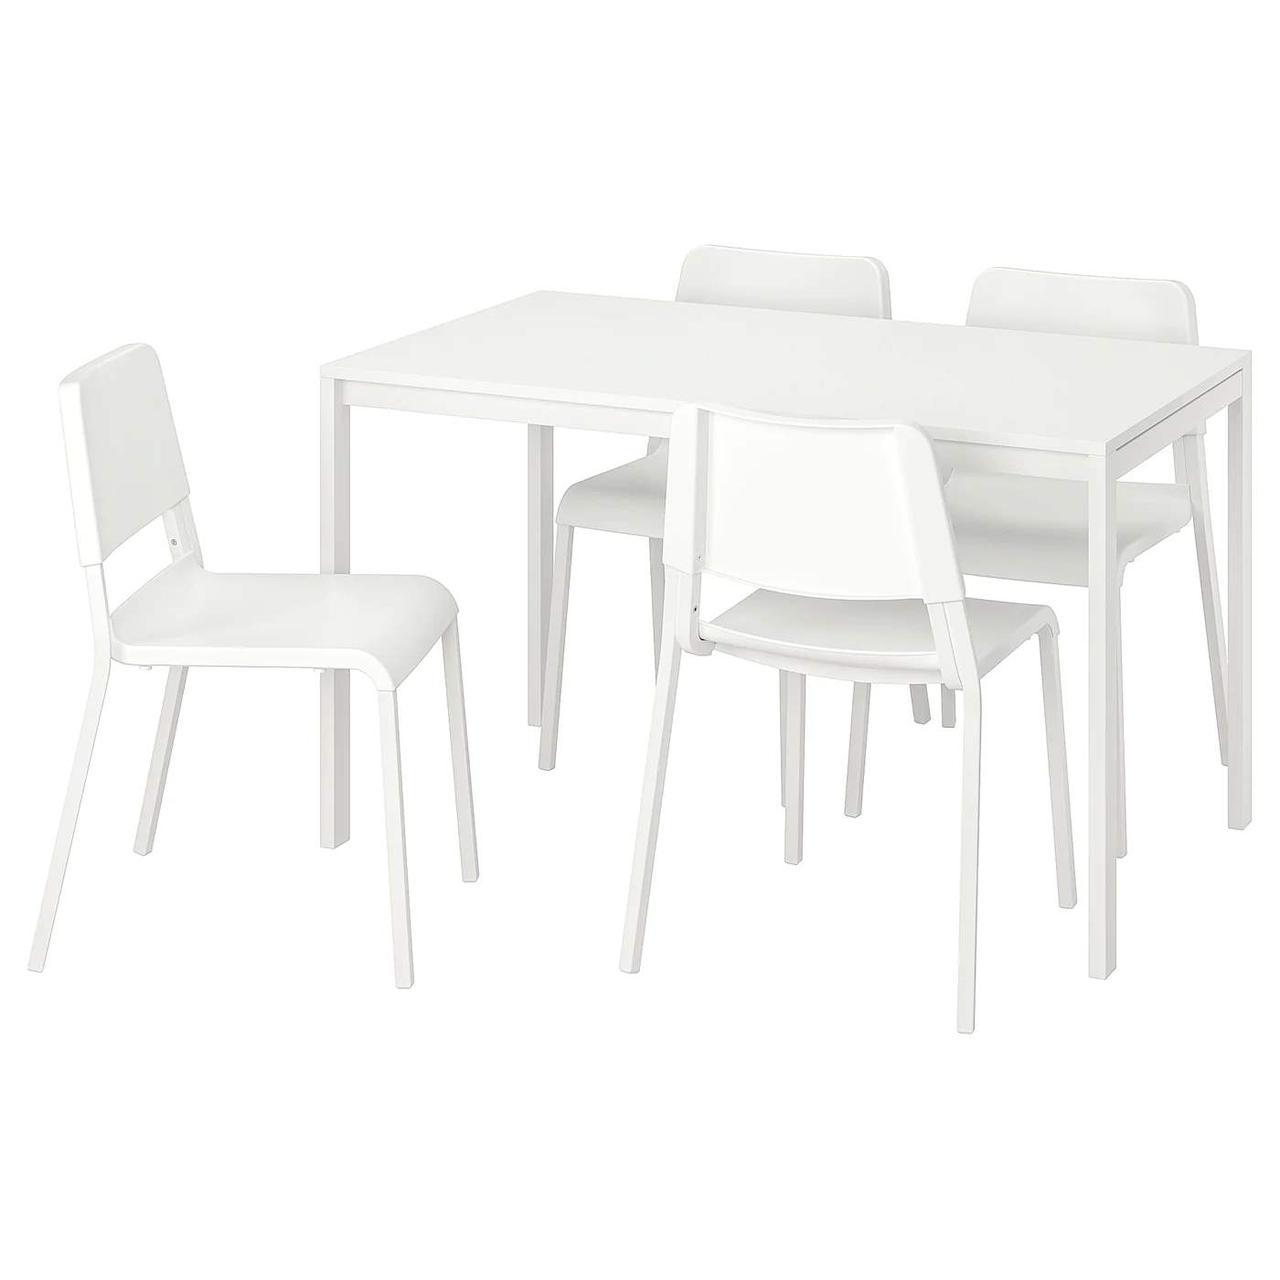 Стол и 4 стула MELLTORP / TEODORES